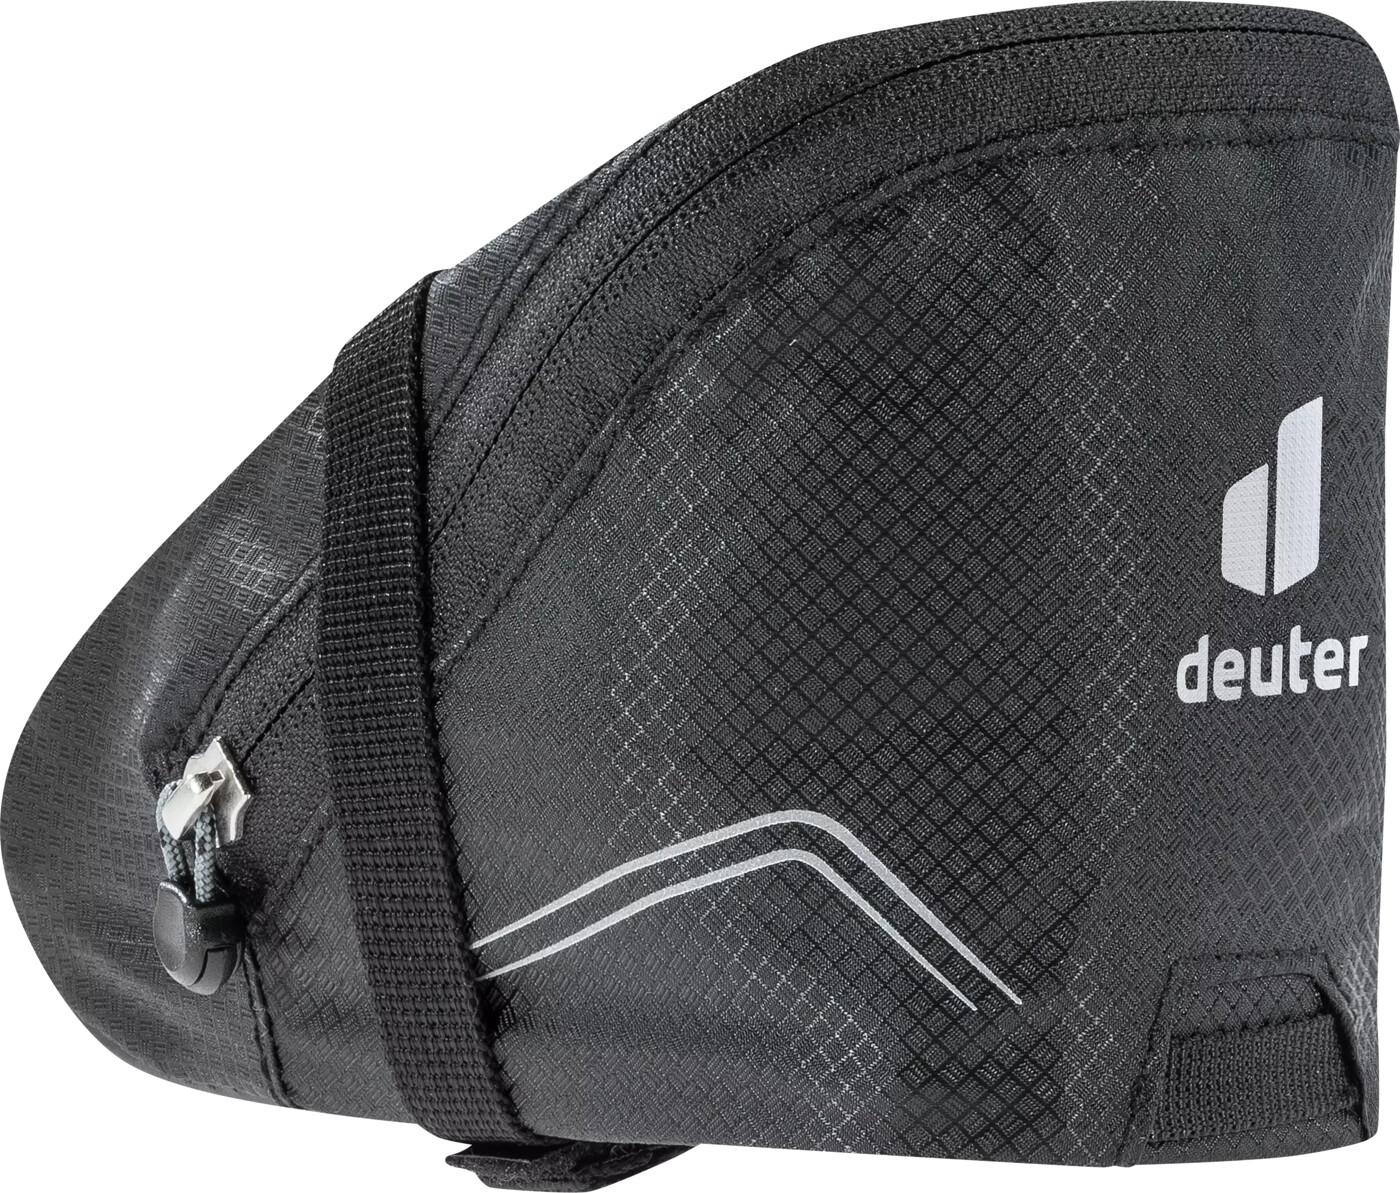 DEUTER Bike Bag I Fahrradtasche